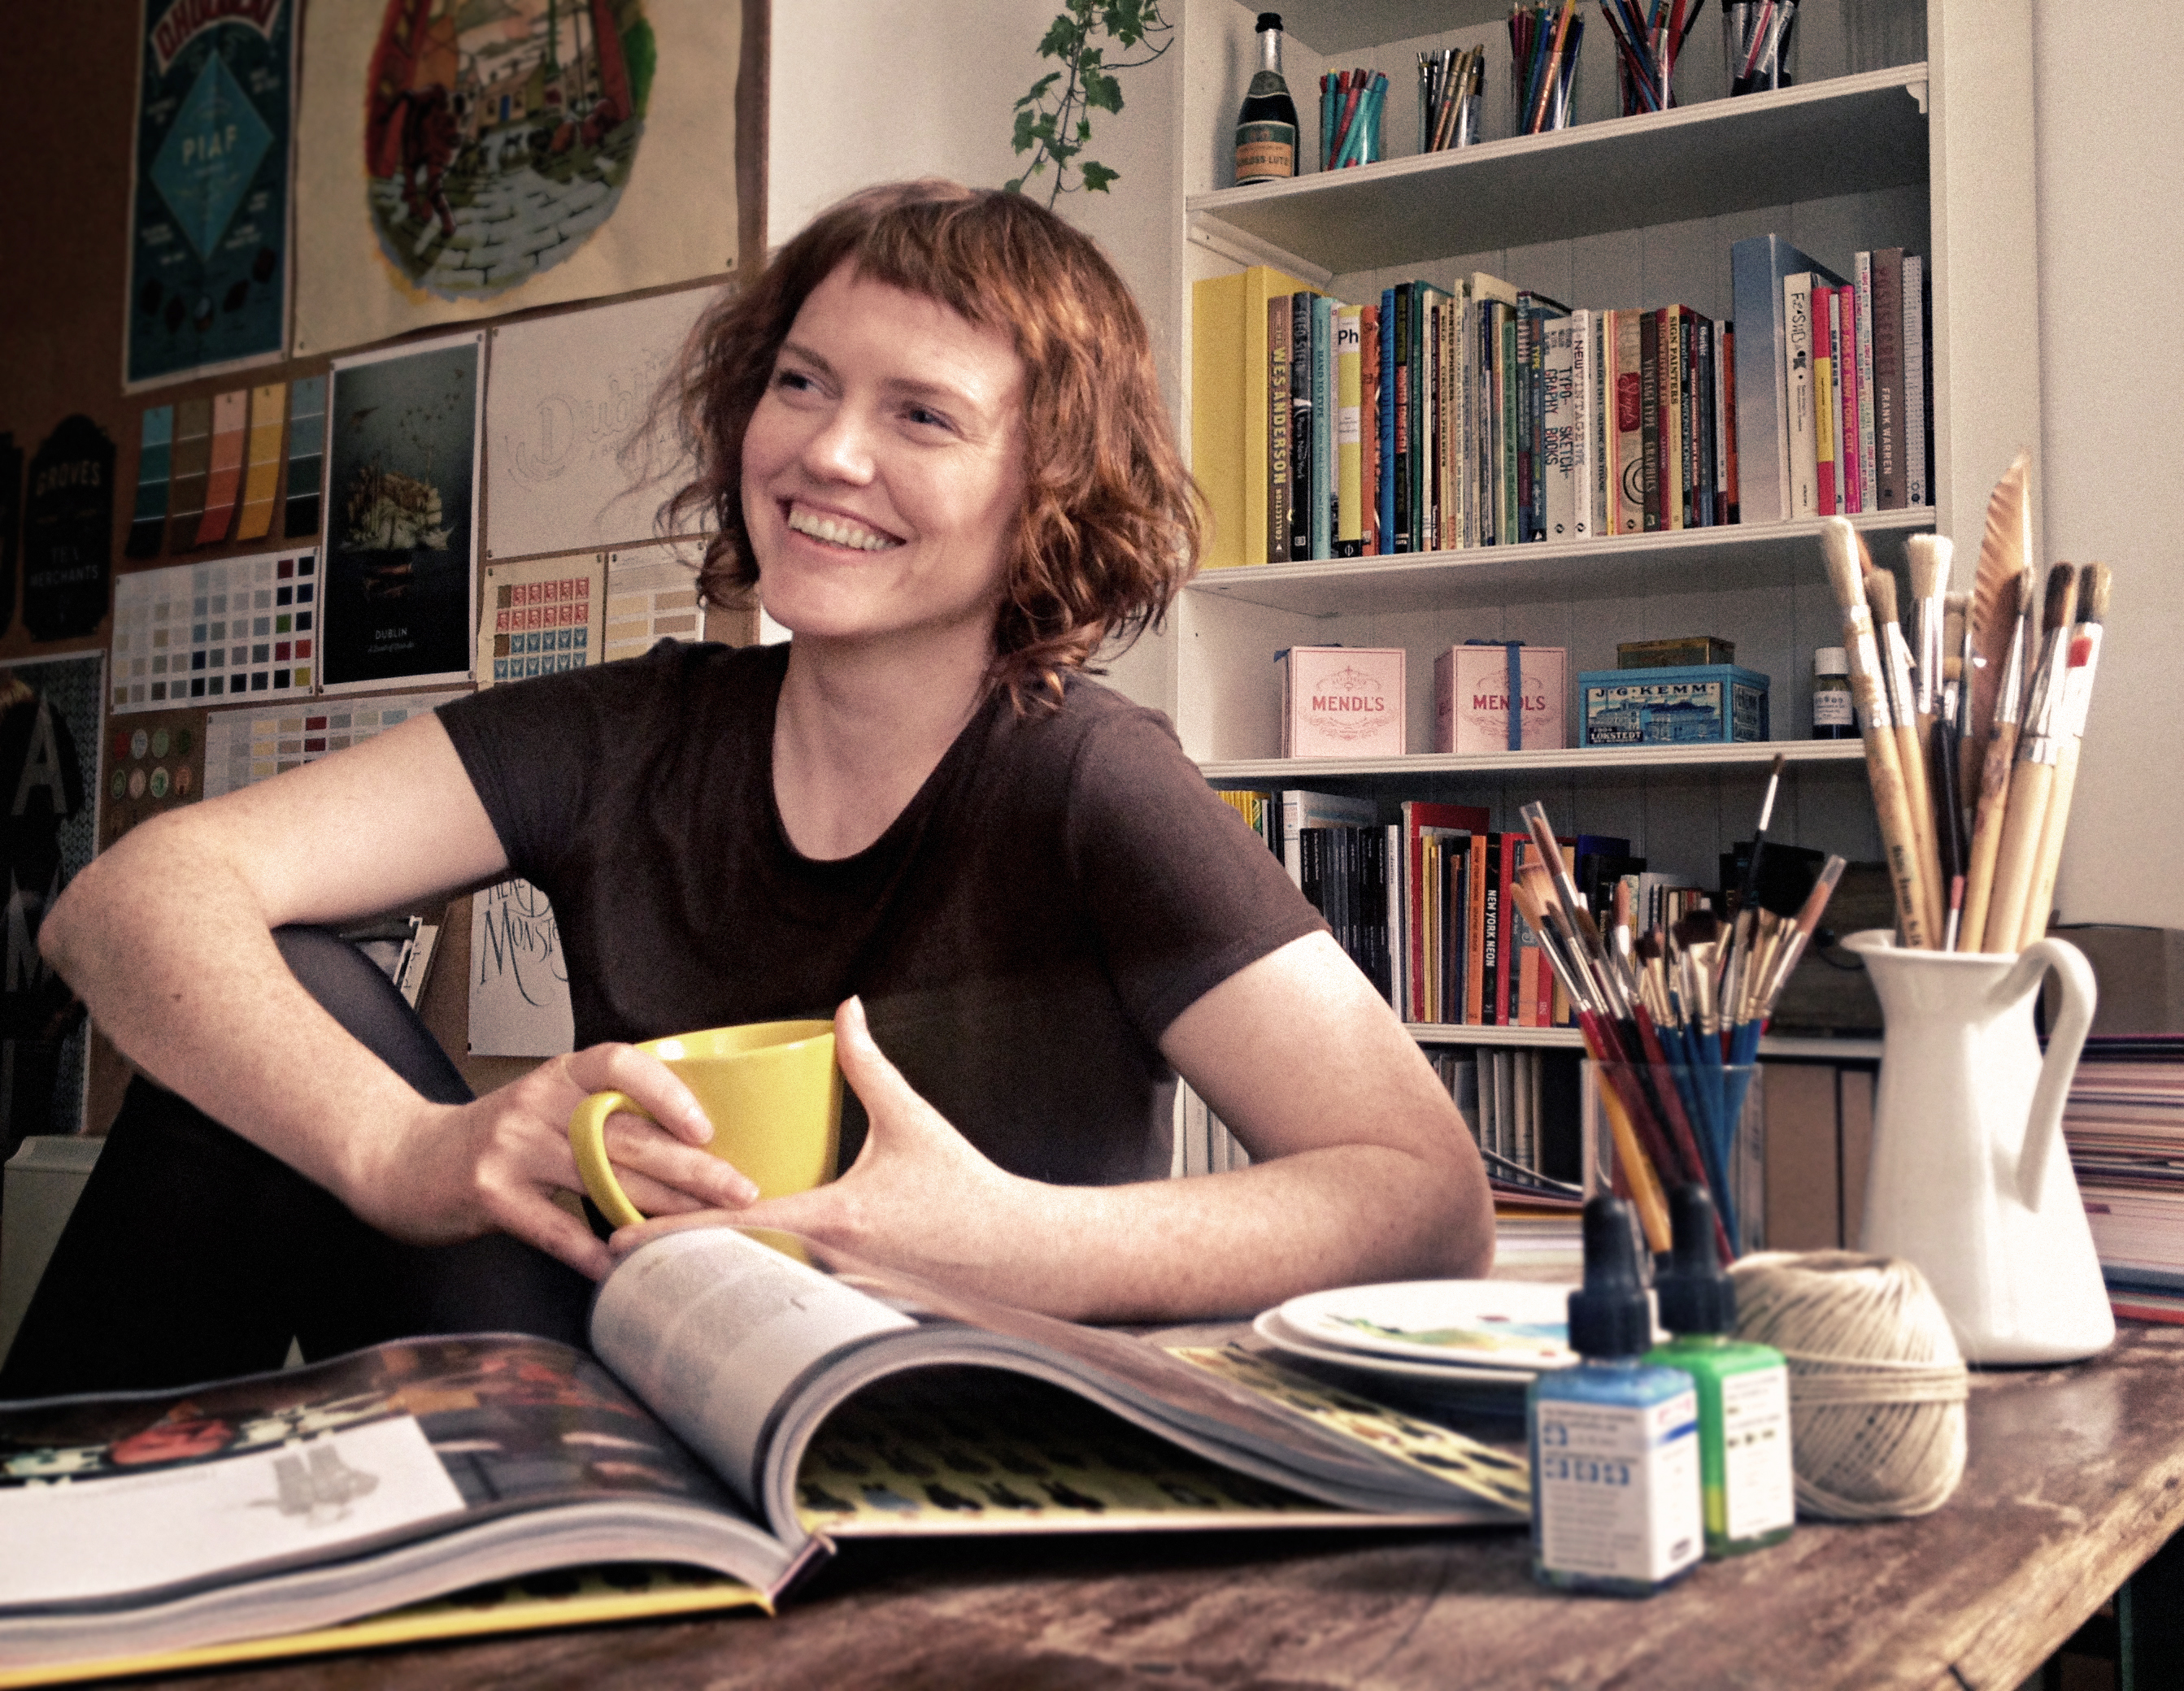 Annie Atkins, graphic designer for film, in her studio